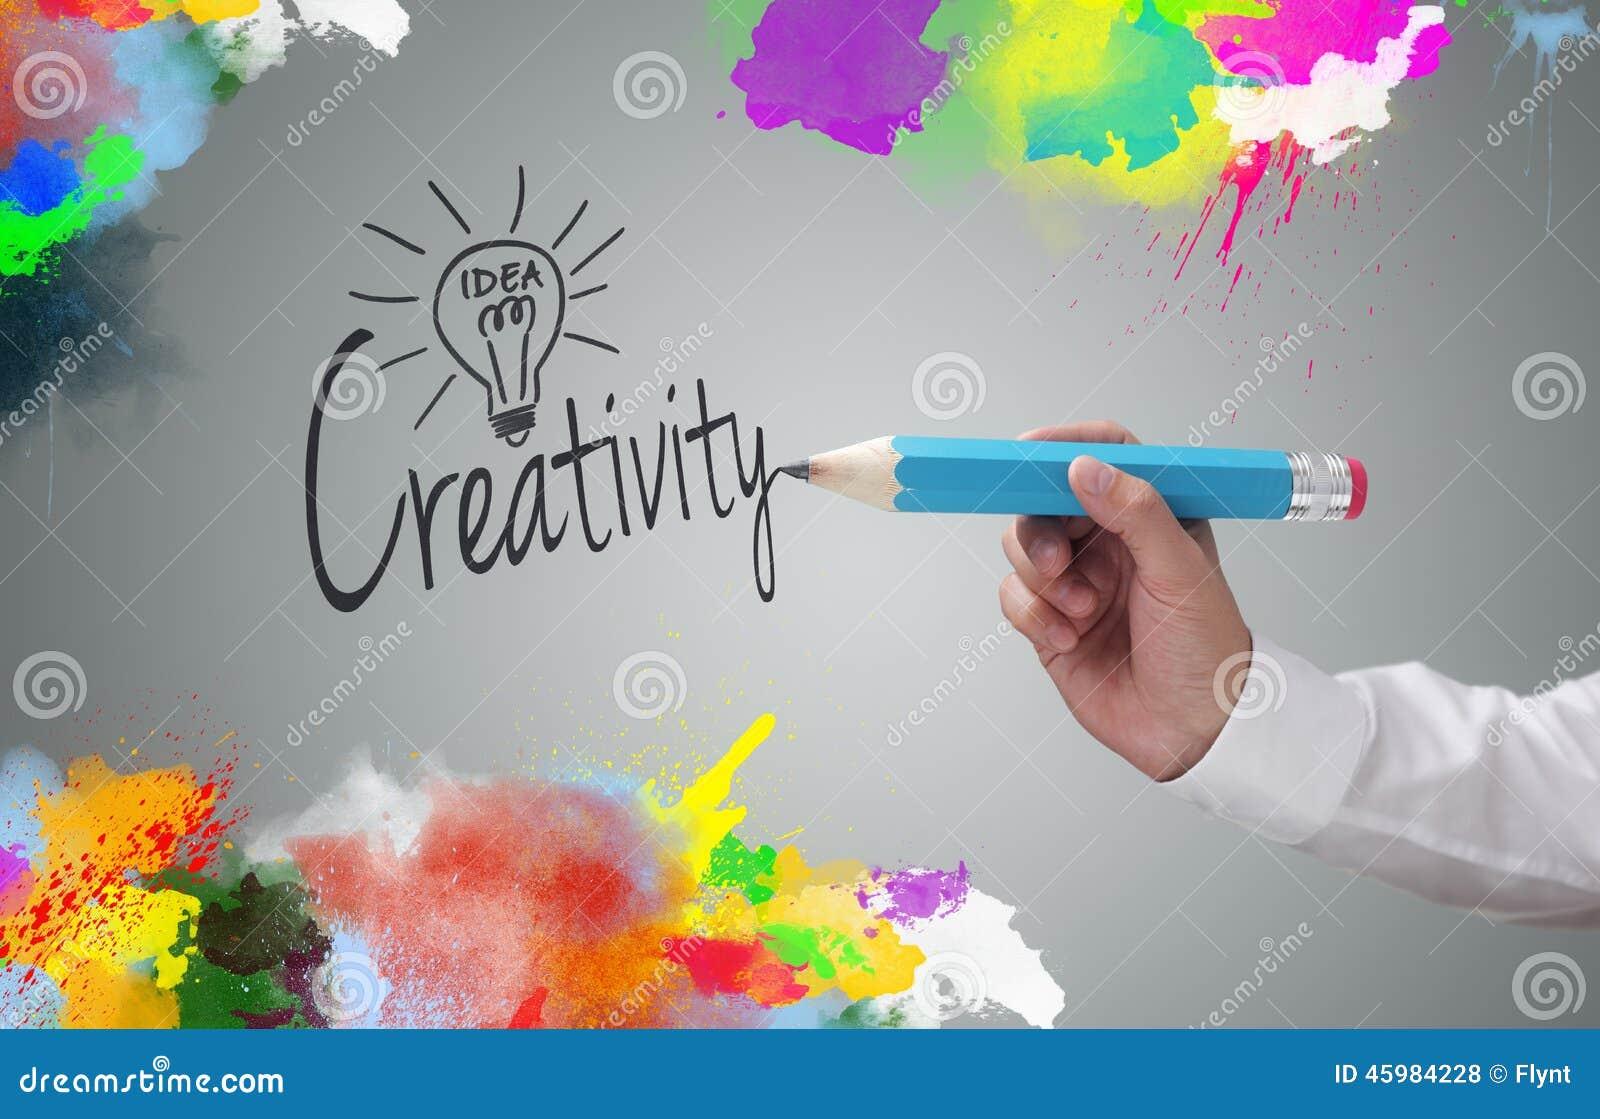 Creatividade